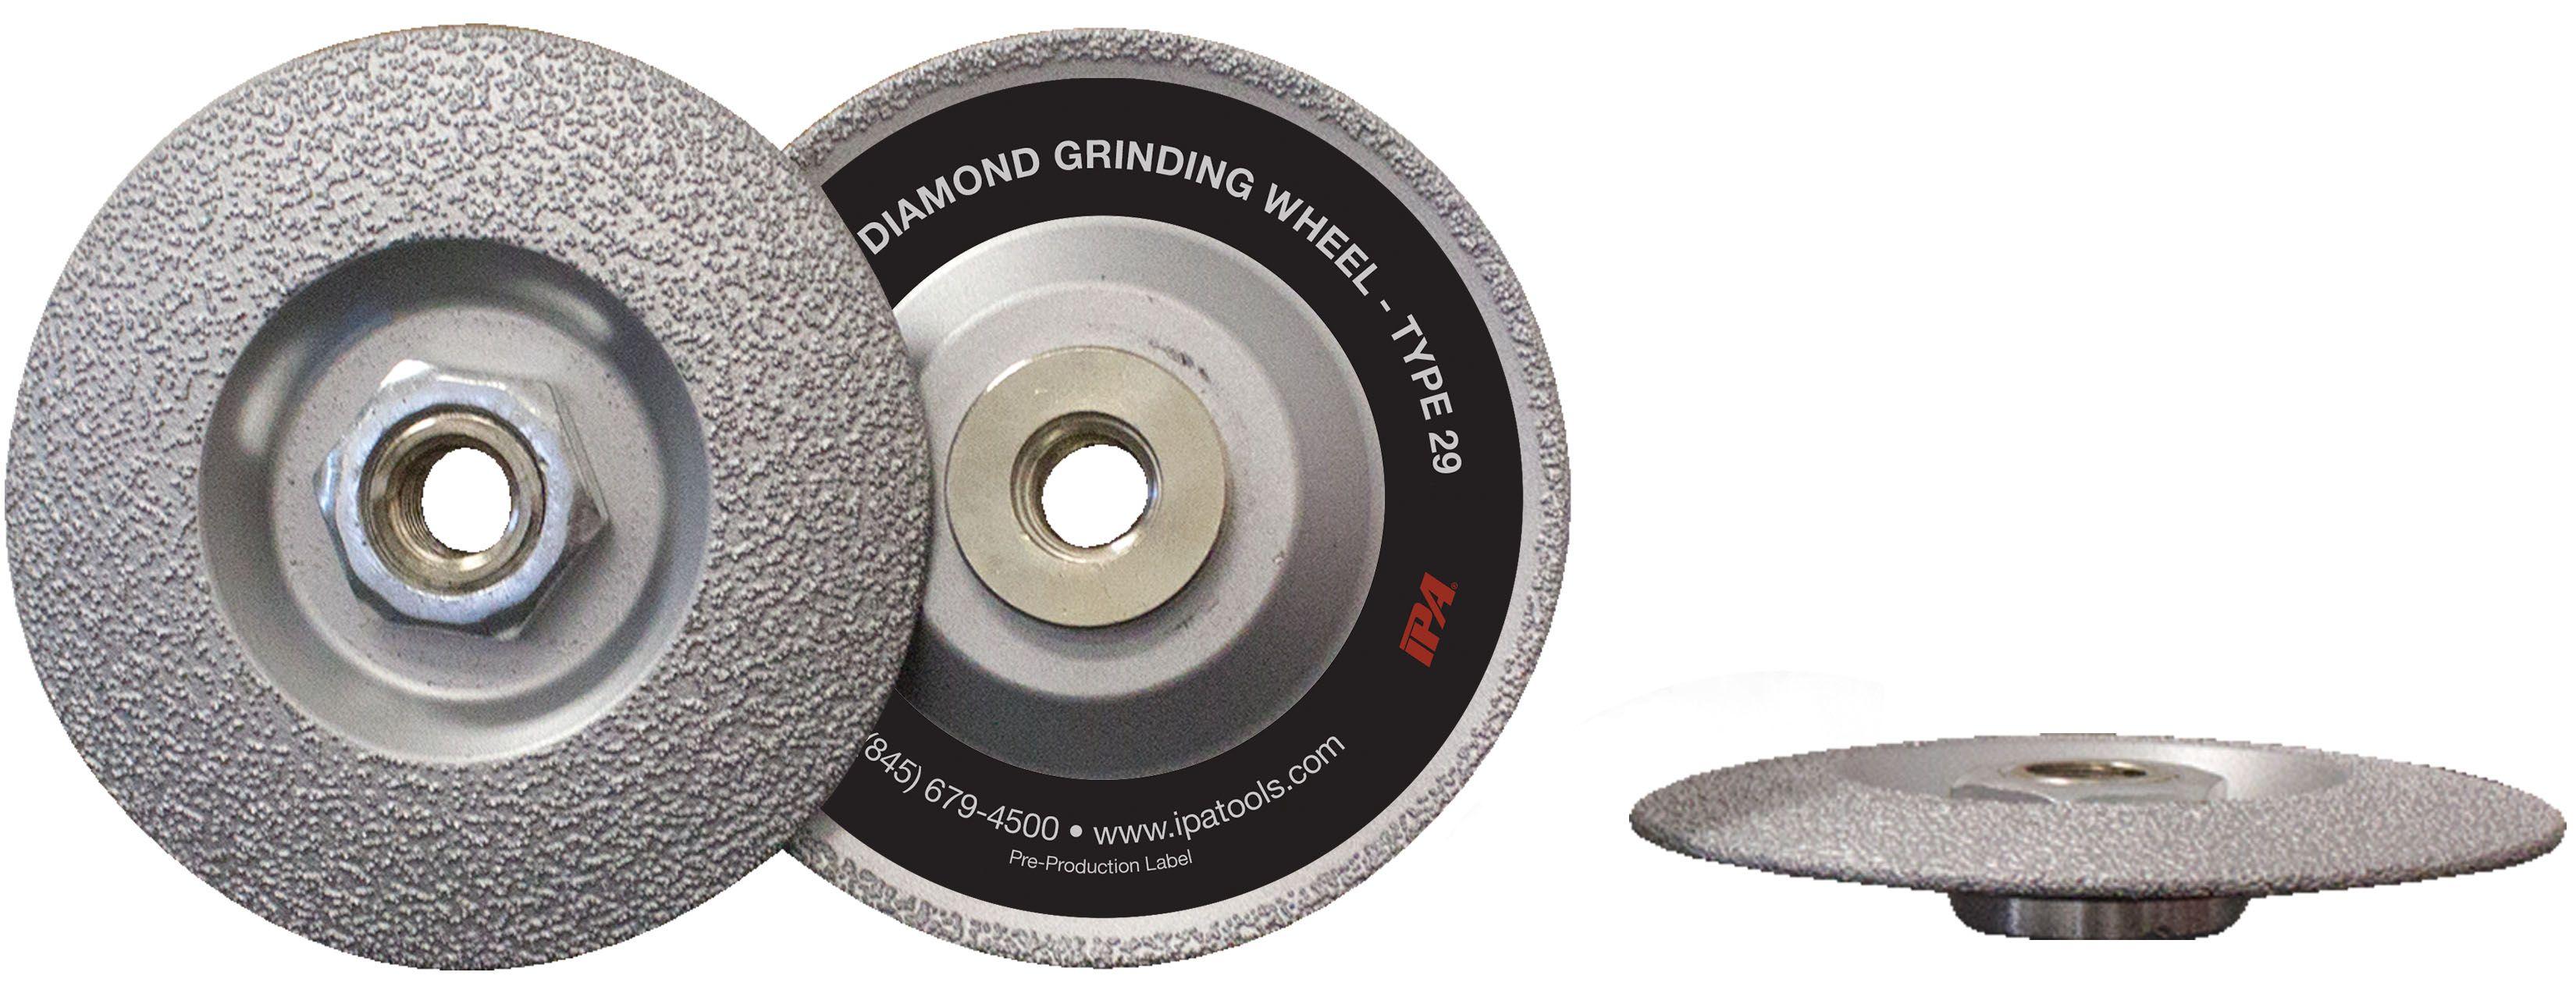 IPA Has New Diamond Grinding Wheel